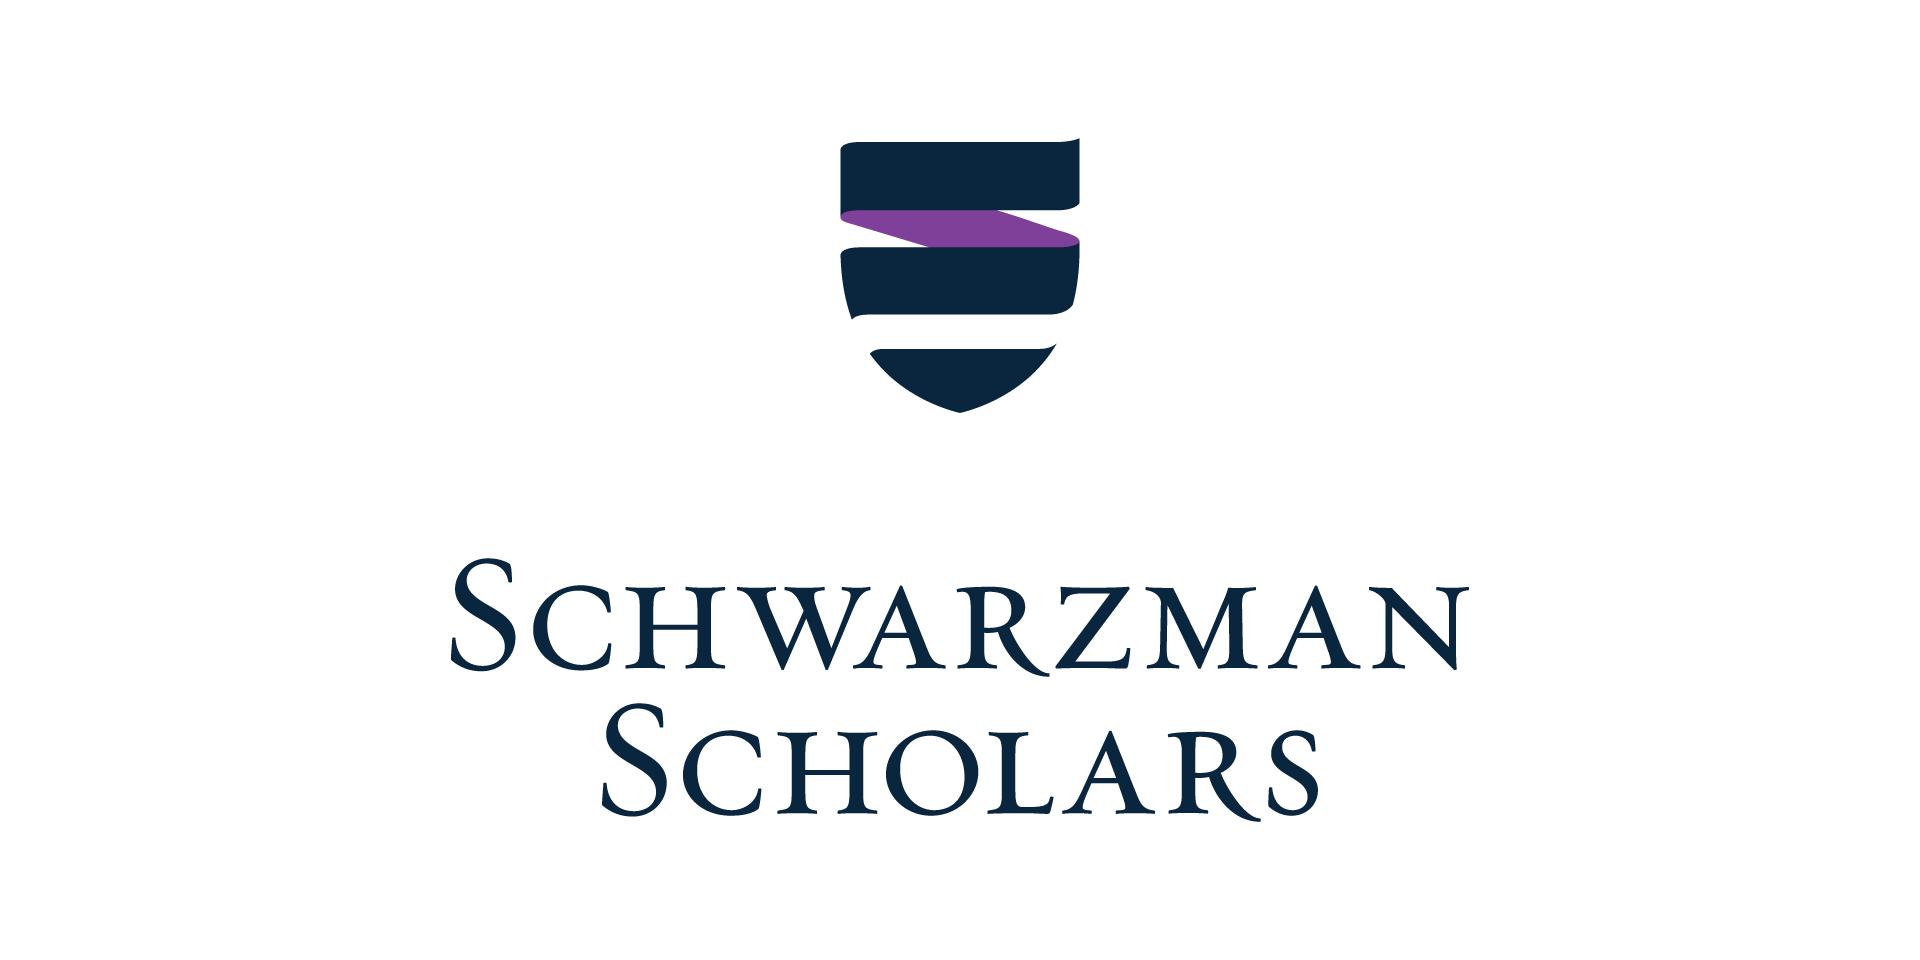 [Schwarzman Scholars] Private Applicant Event - New York City